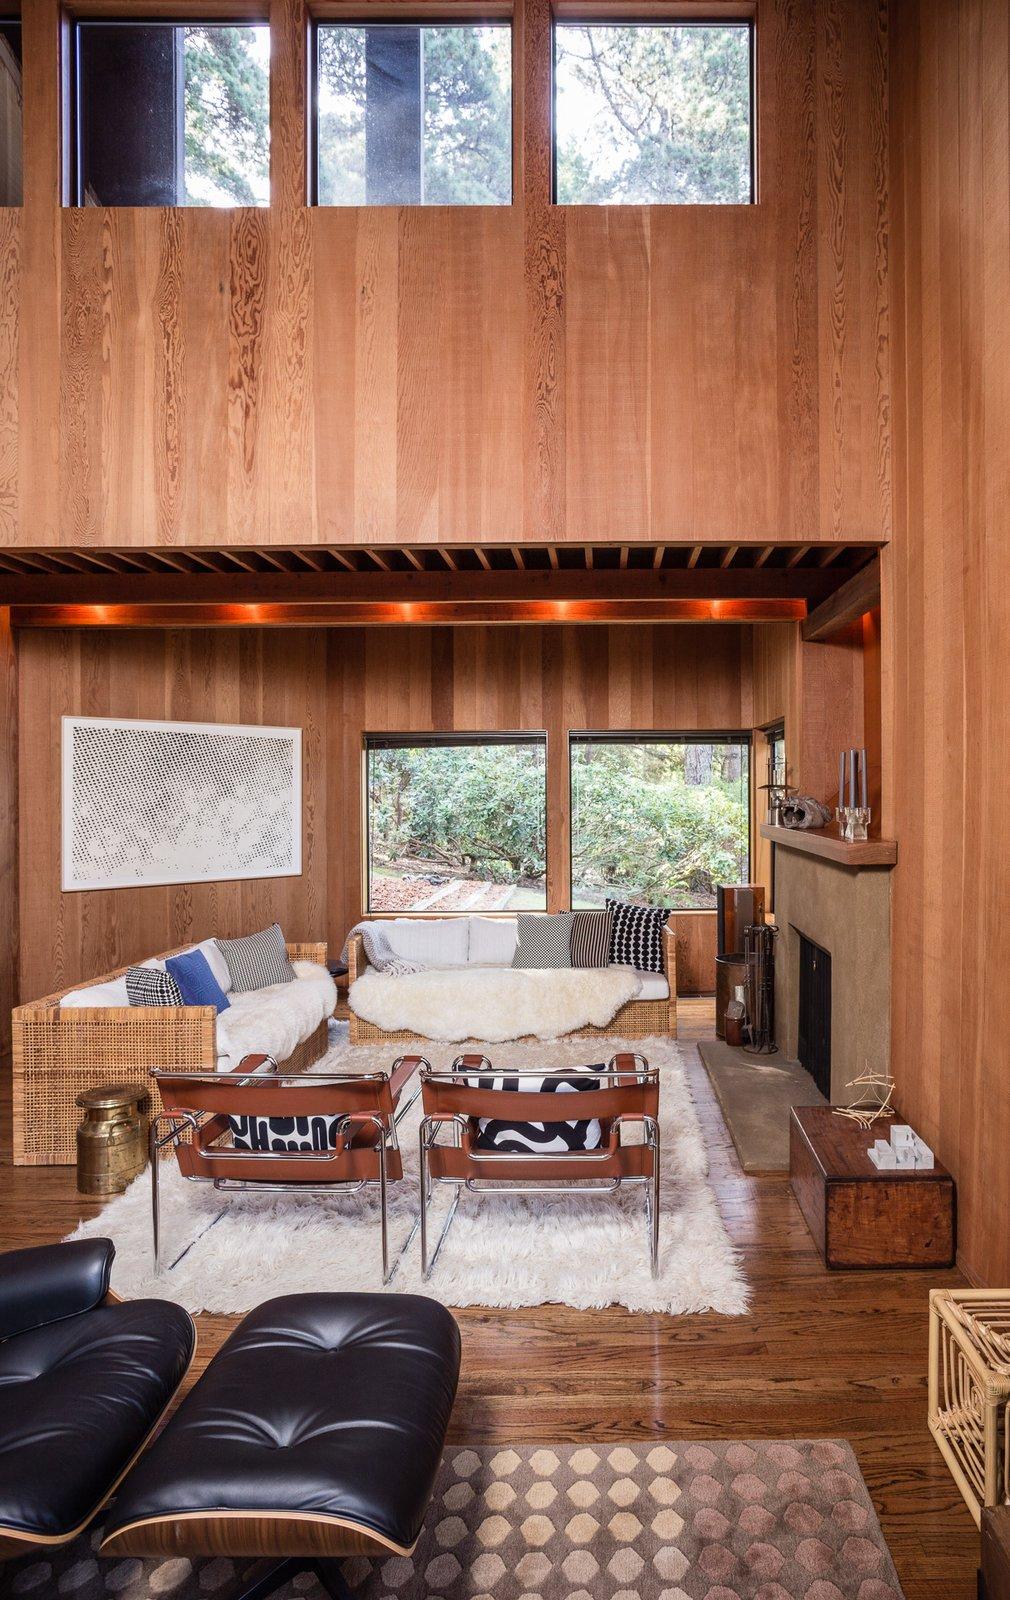 A California casual vibe engulfs the living area.